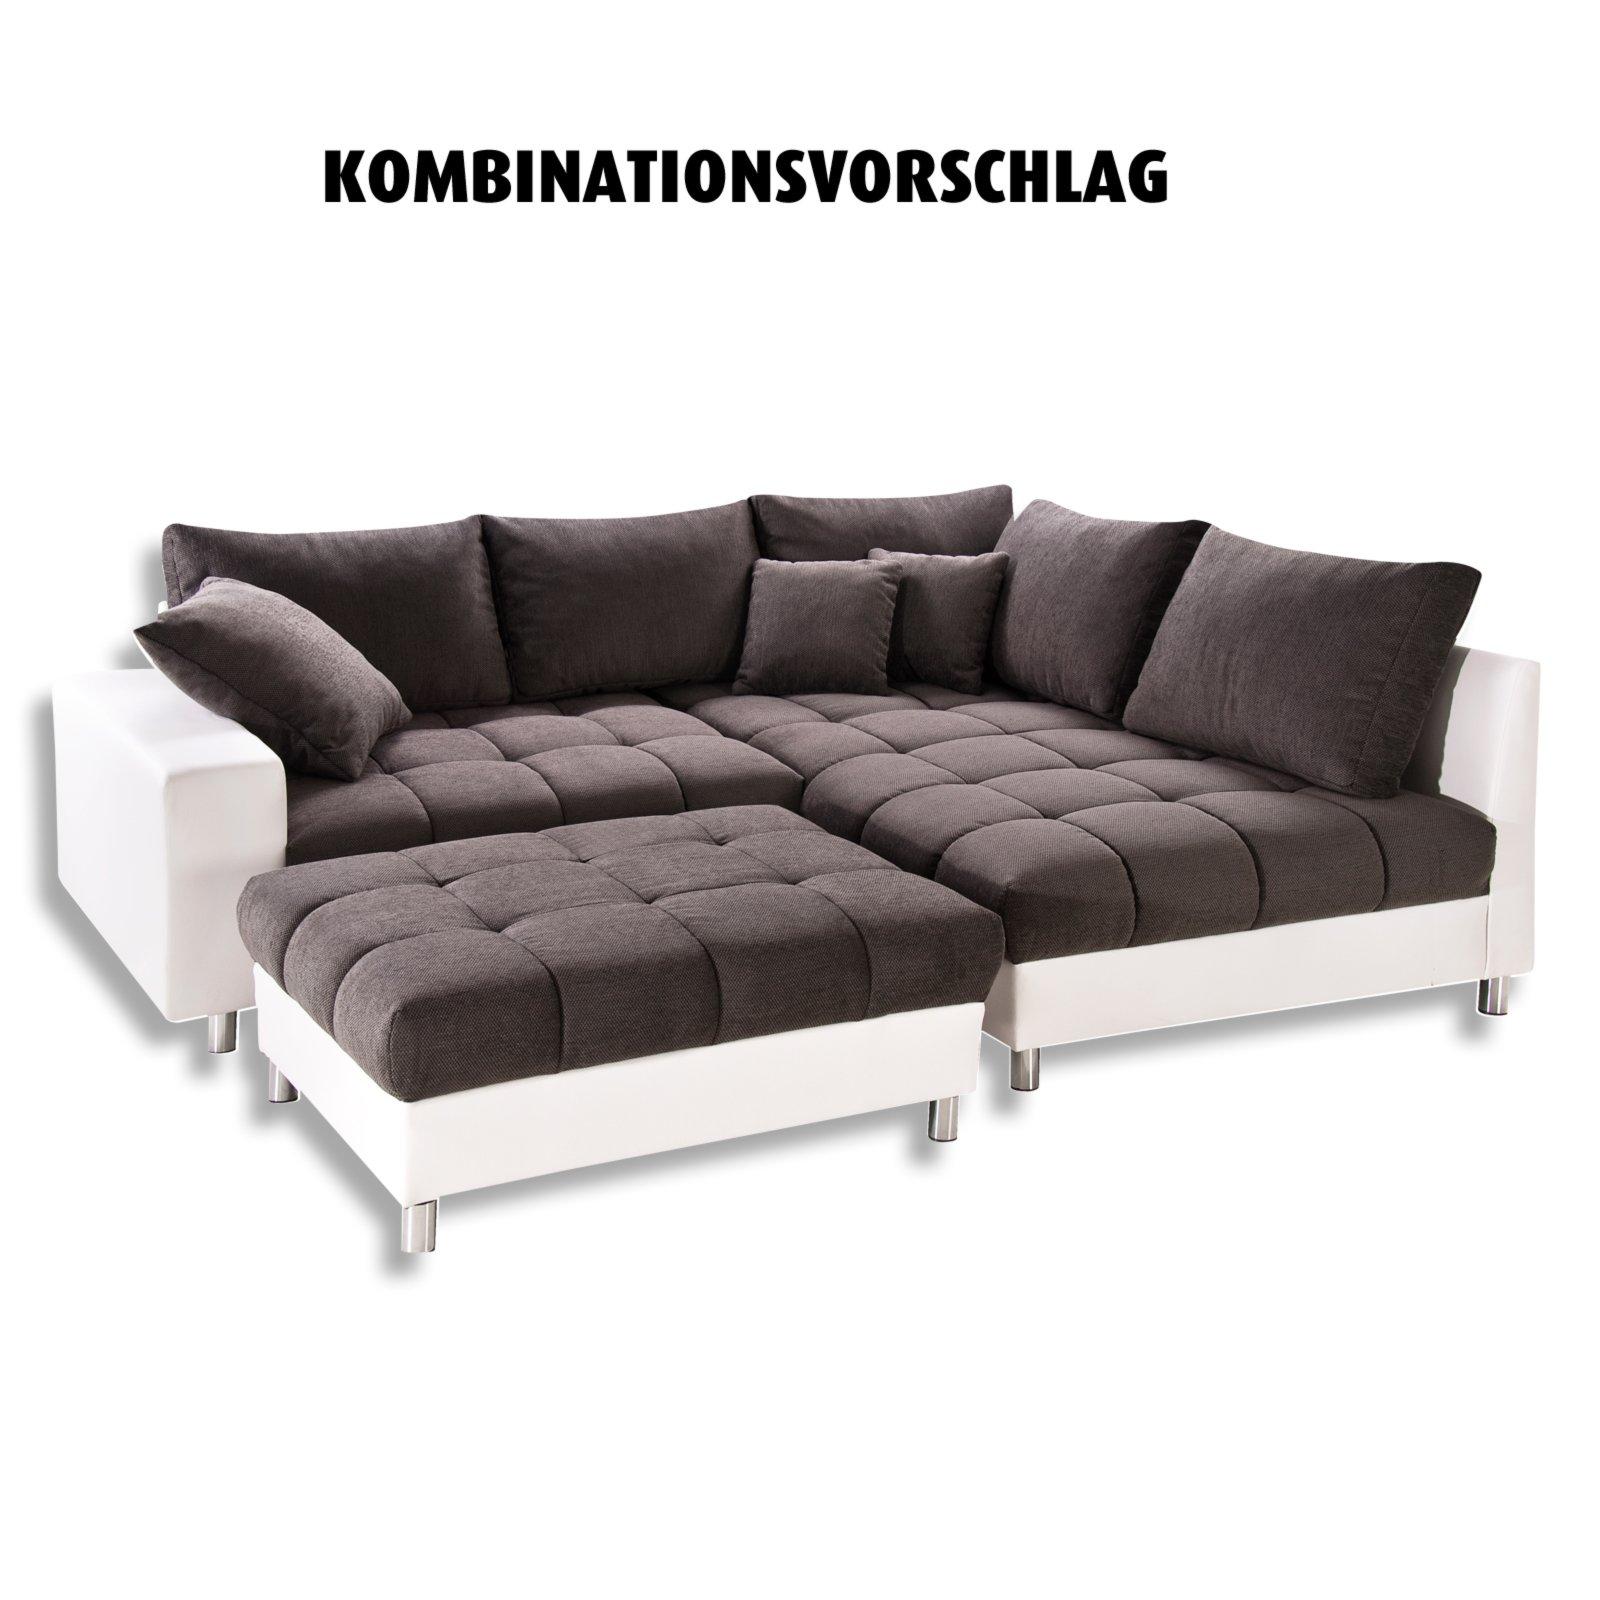 Eckgarnitur - weiß-stone - Armlehne links - Kunstleder   Ecksofas L ...